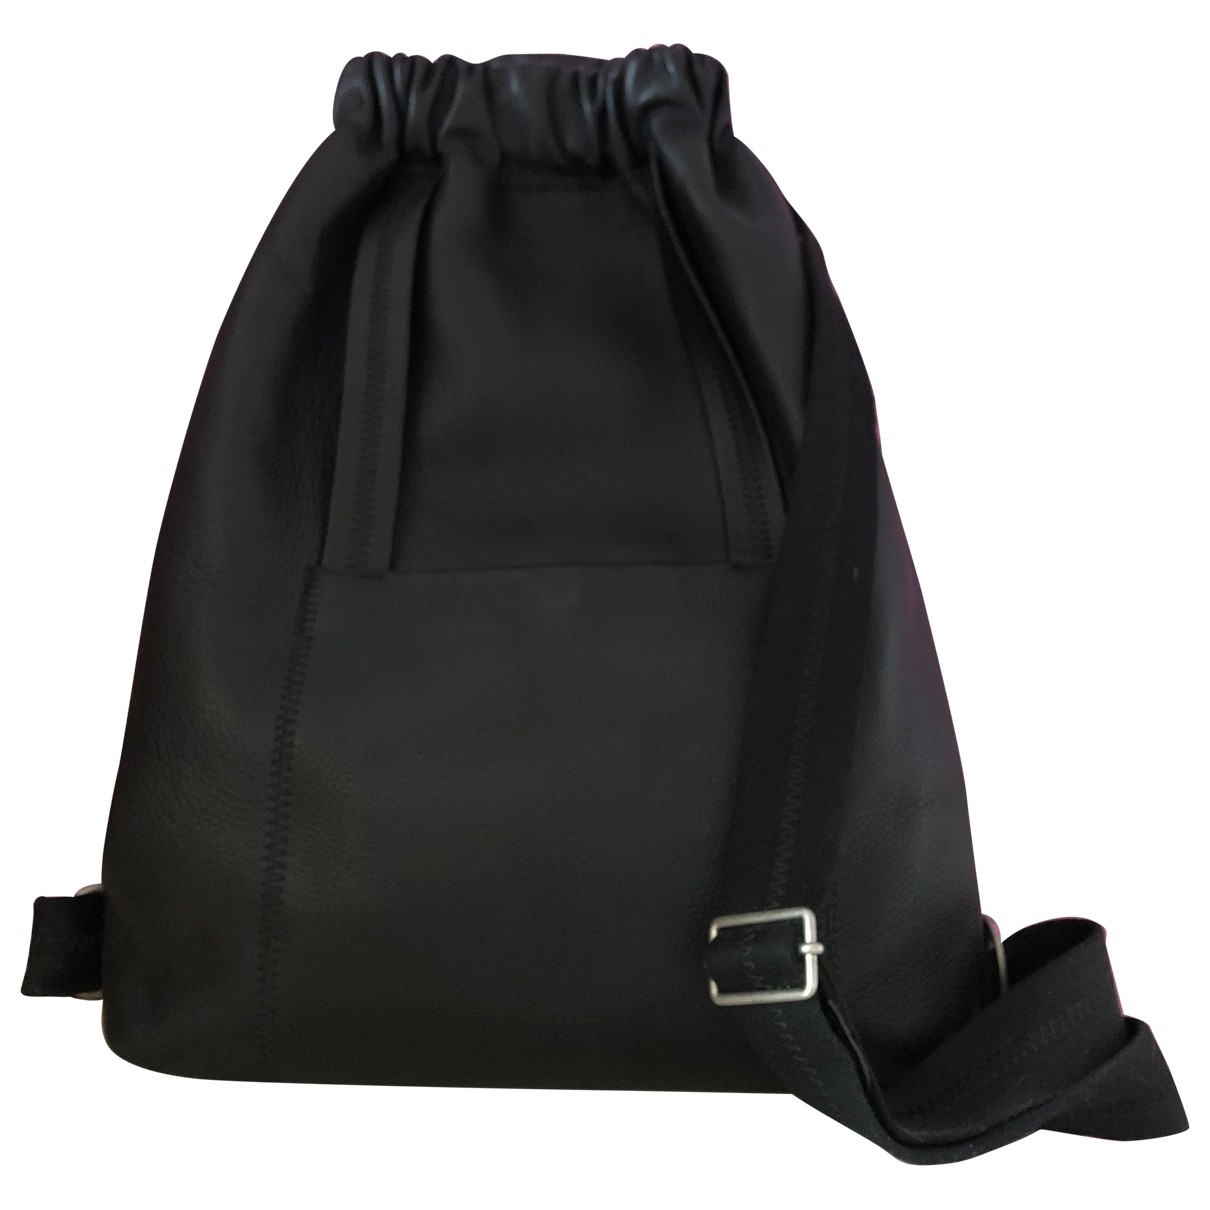 Maison Martin Margiela \N Black Leather backpack for Women \N